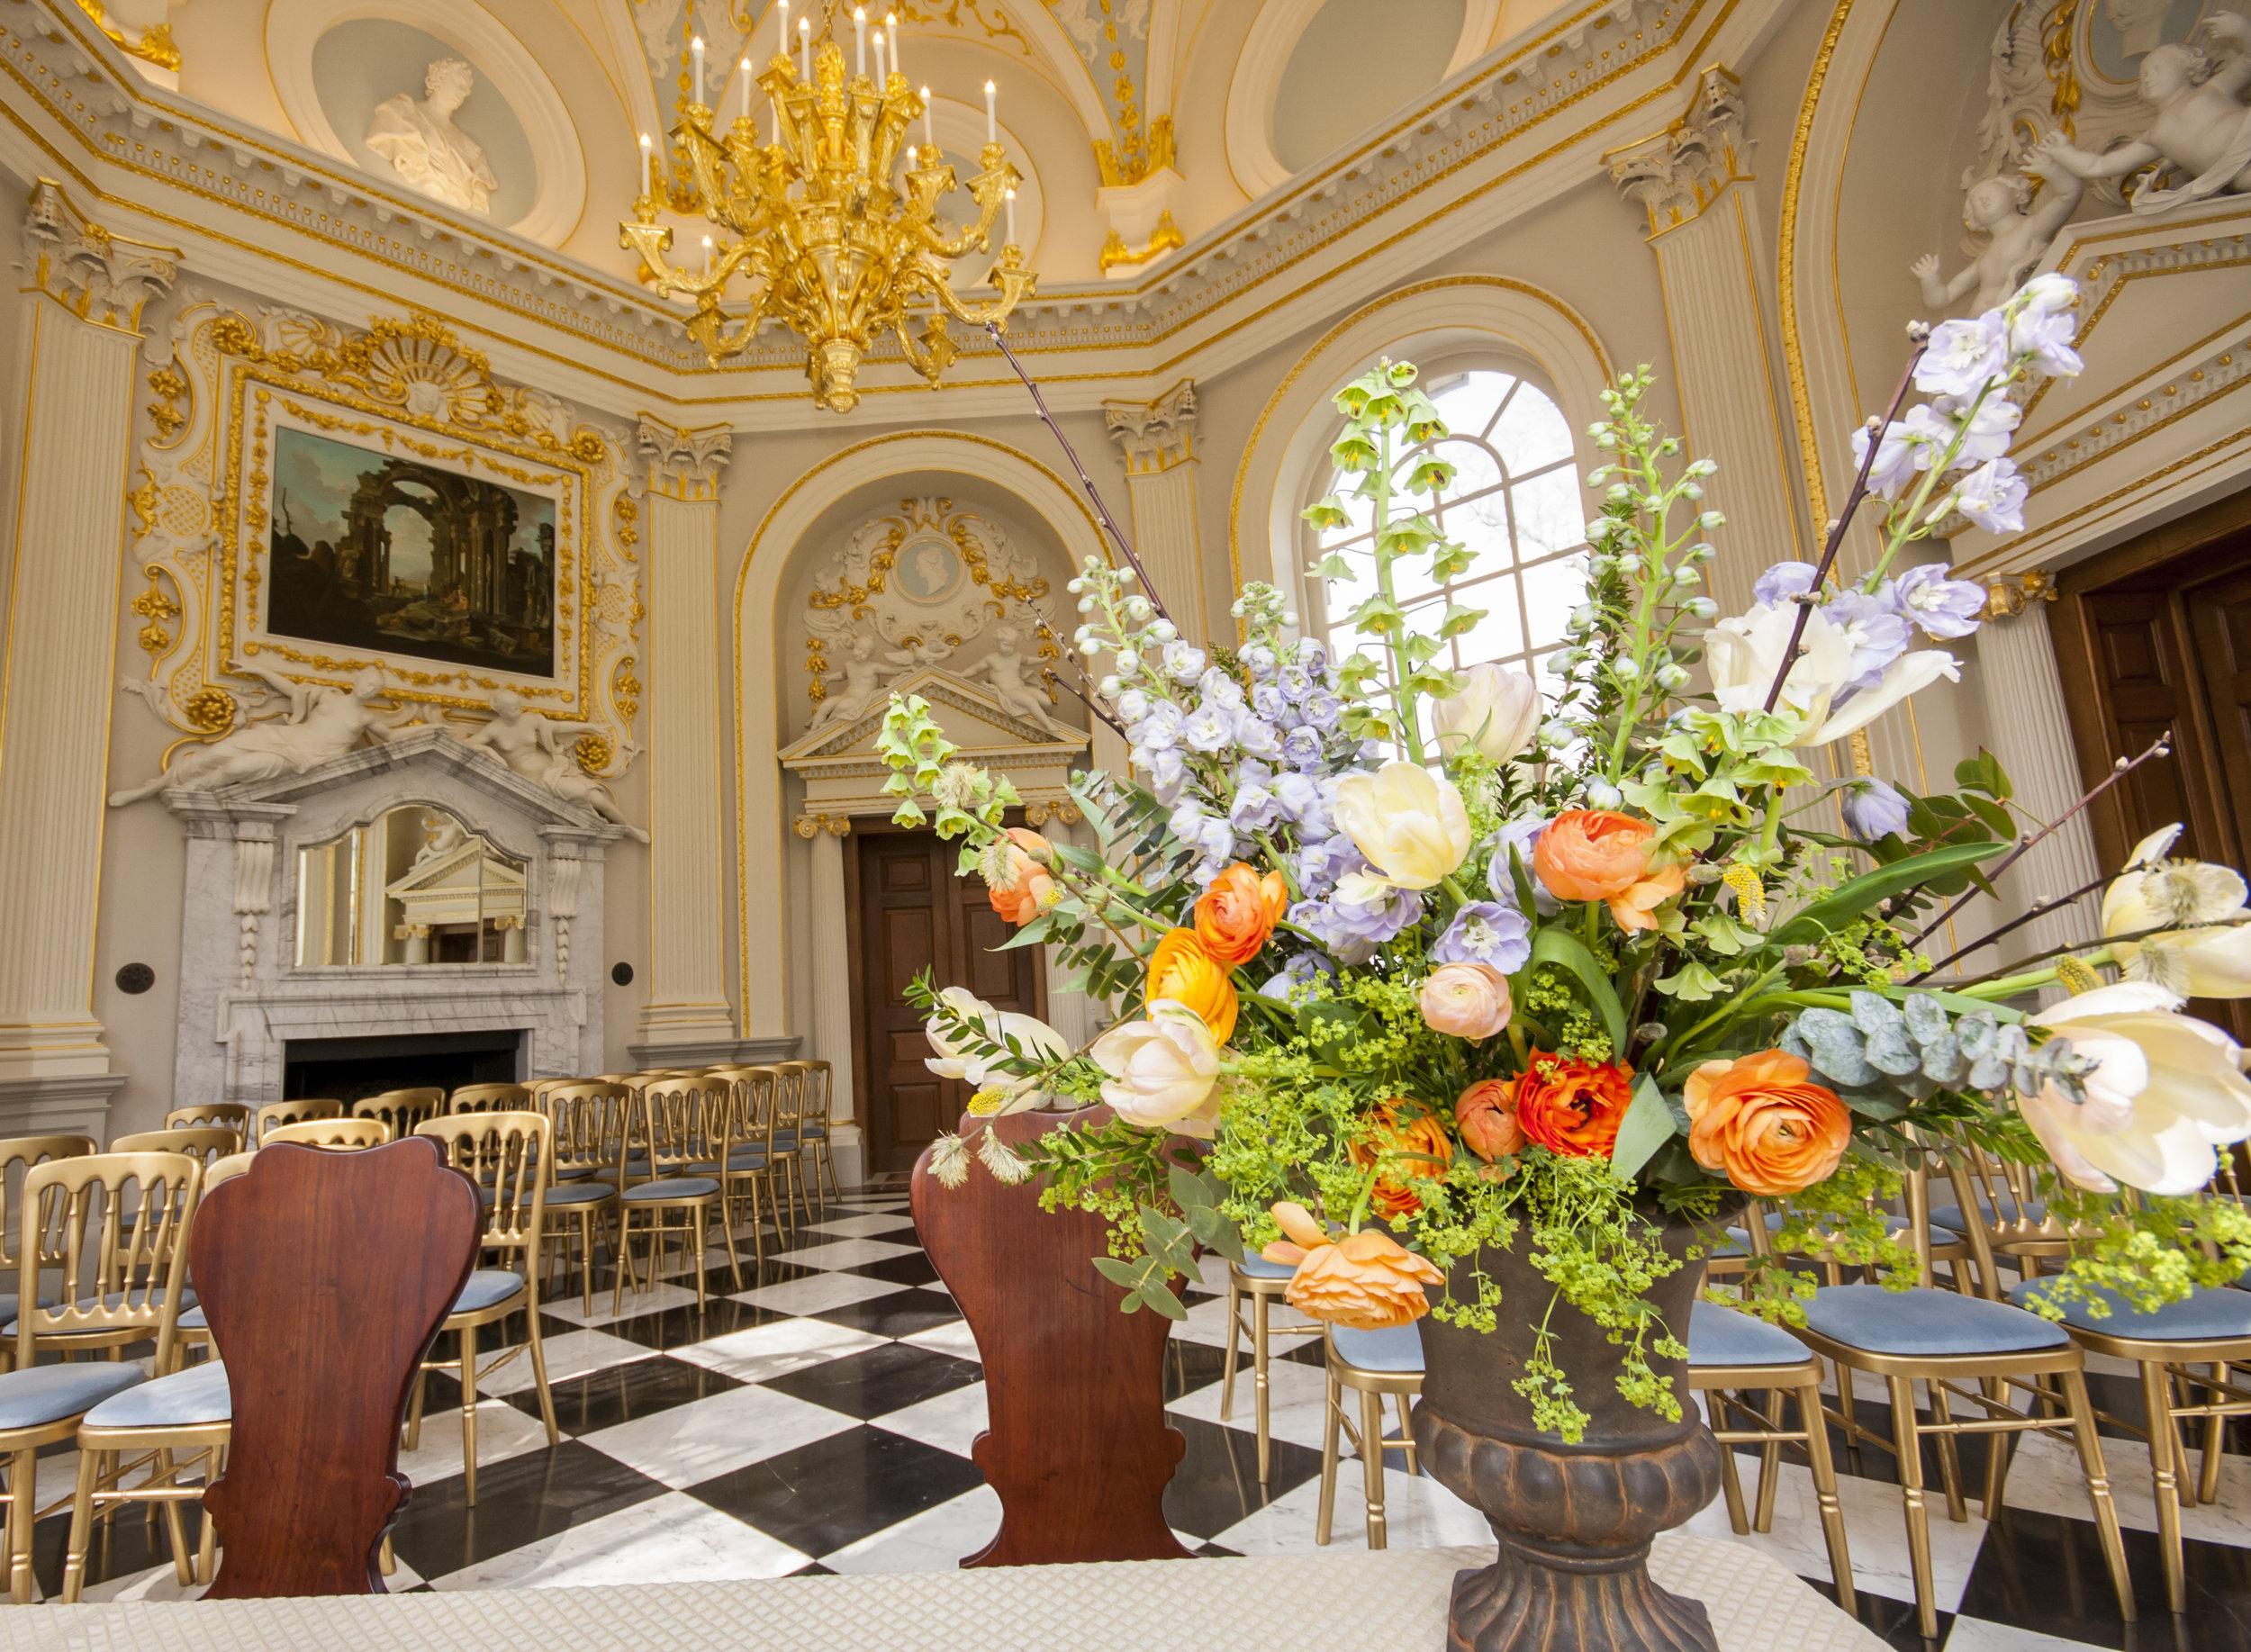 Orleans_House_Twickenham_Wedding_flowers4.jpg